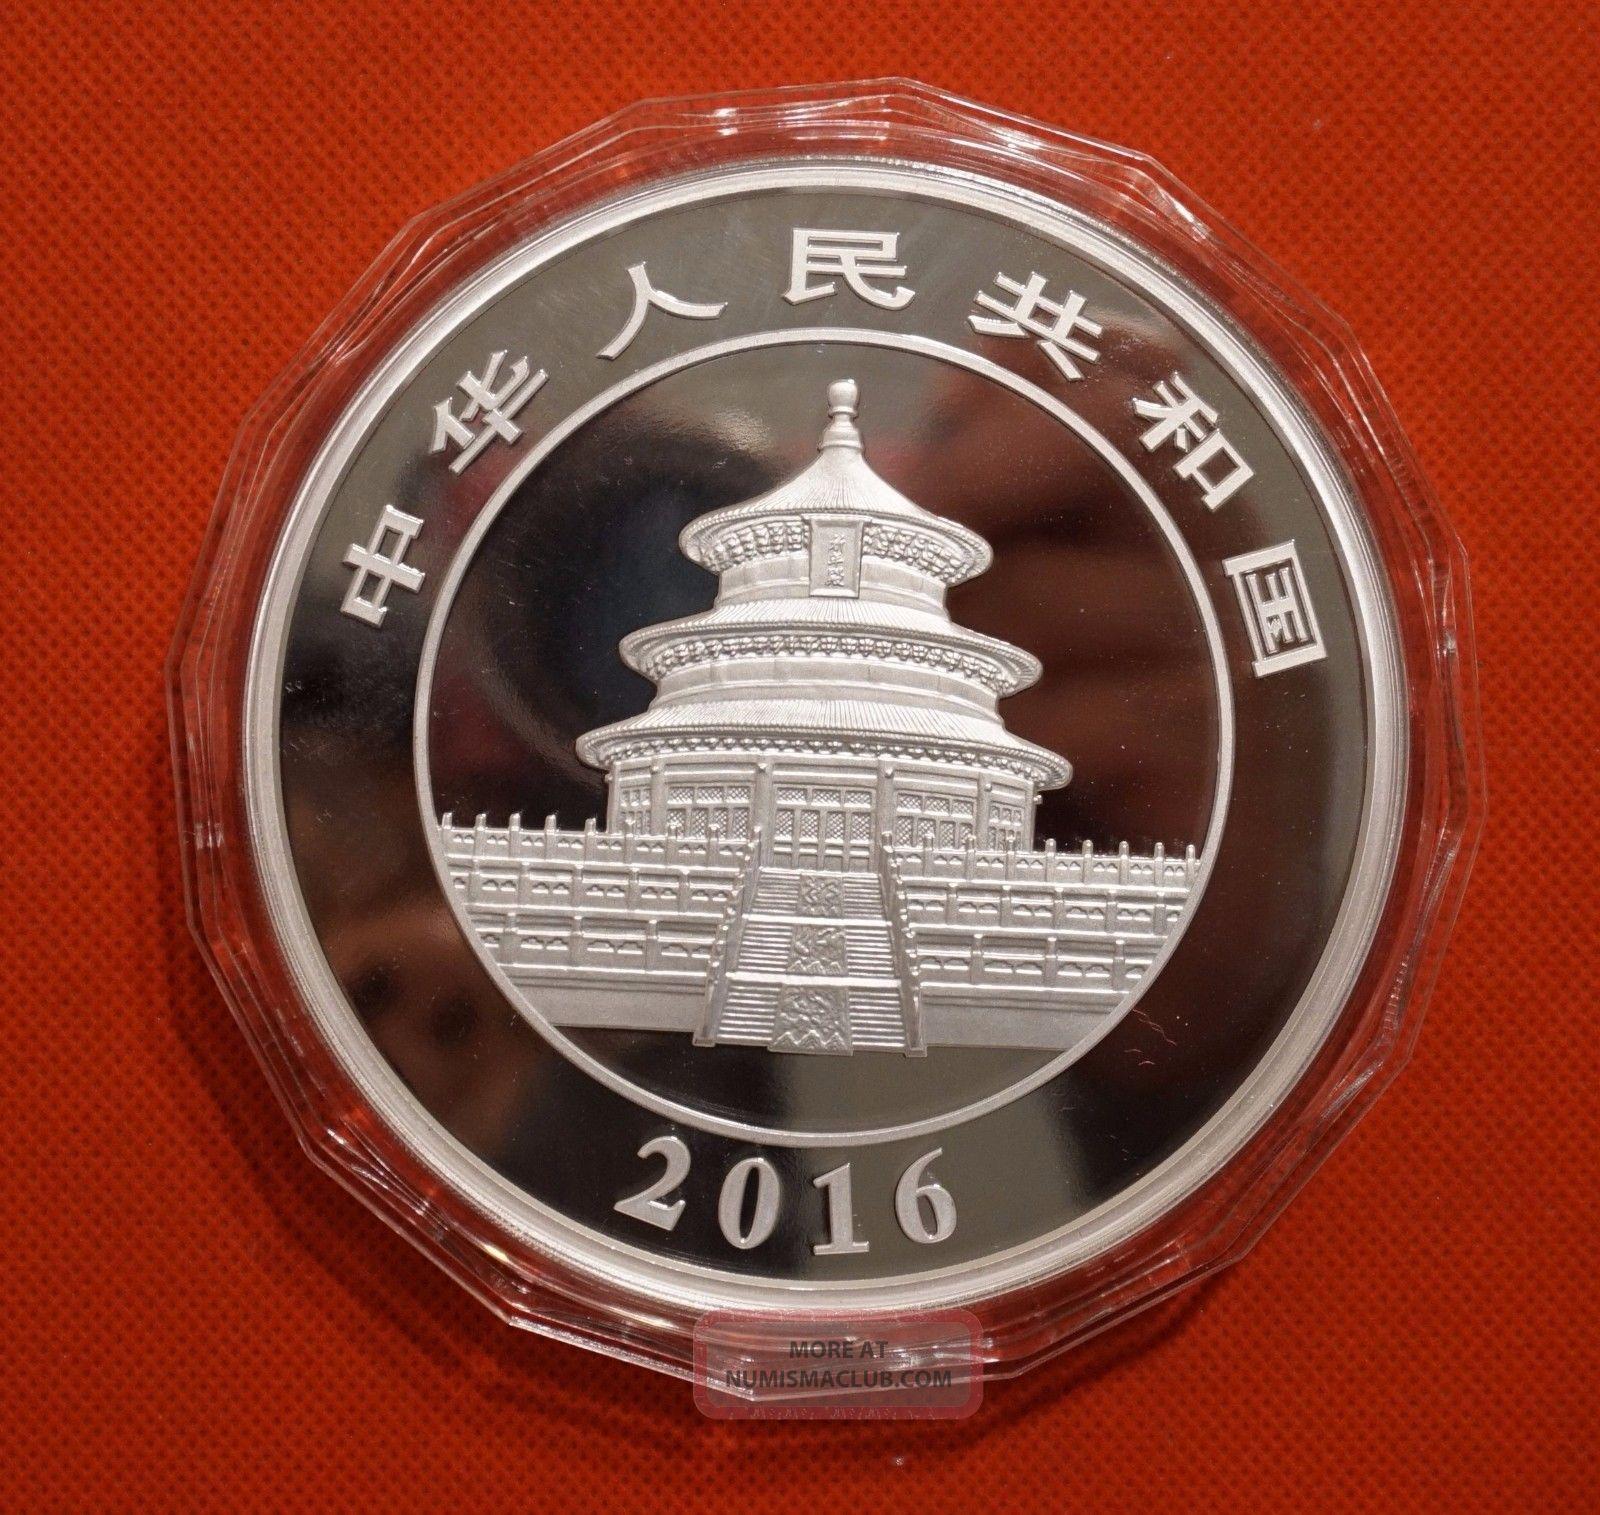 2016 Panda 1kg Silver China Coin Coins: World photo